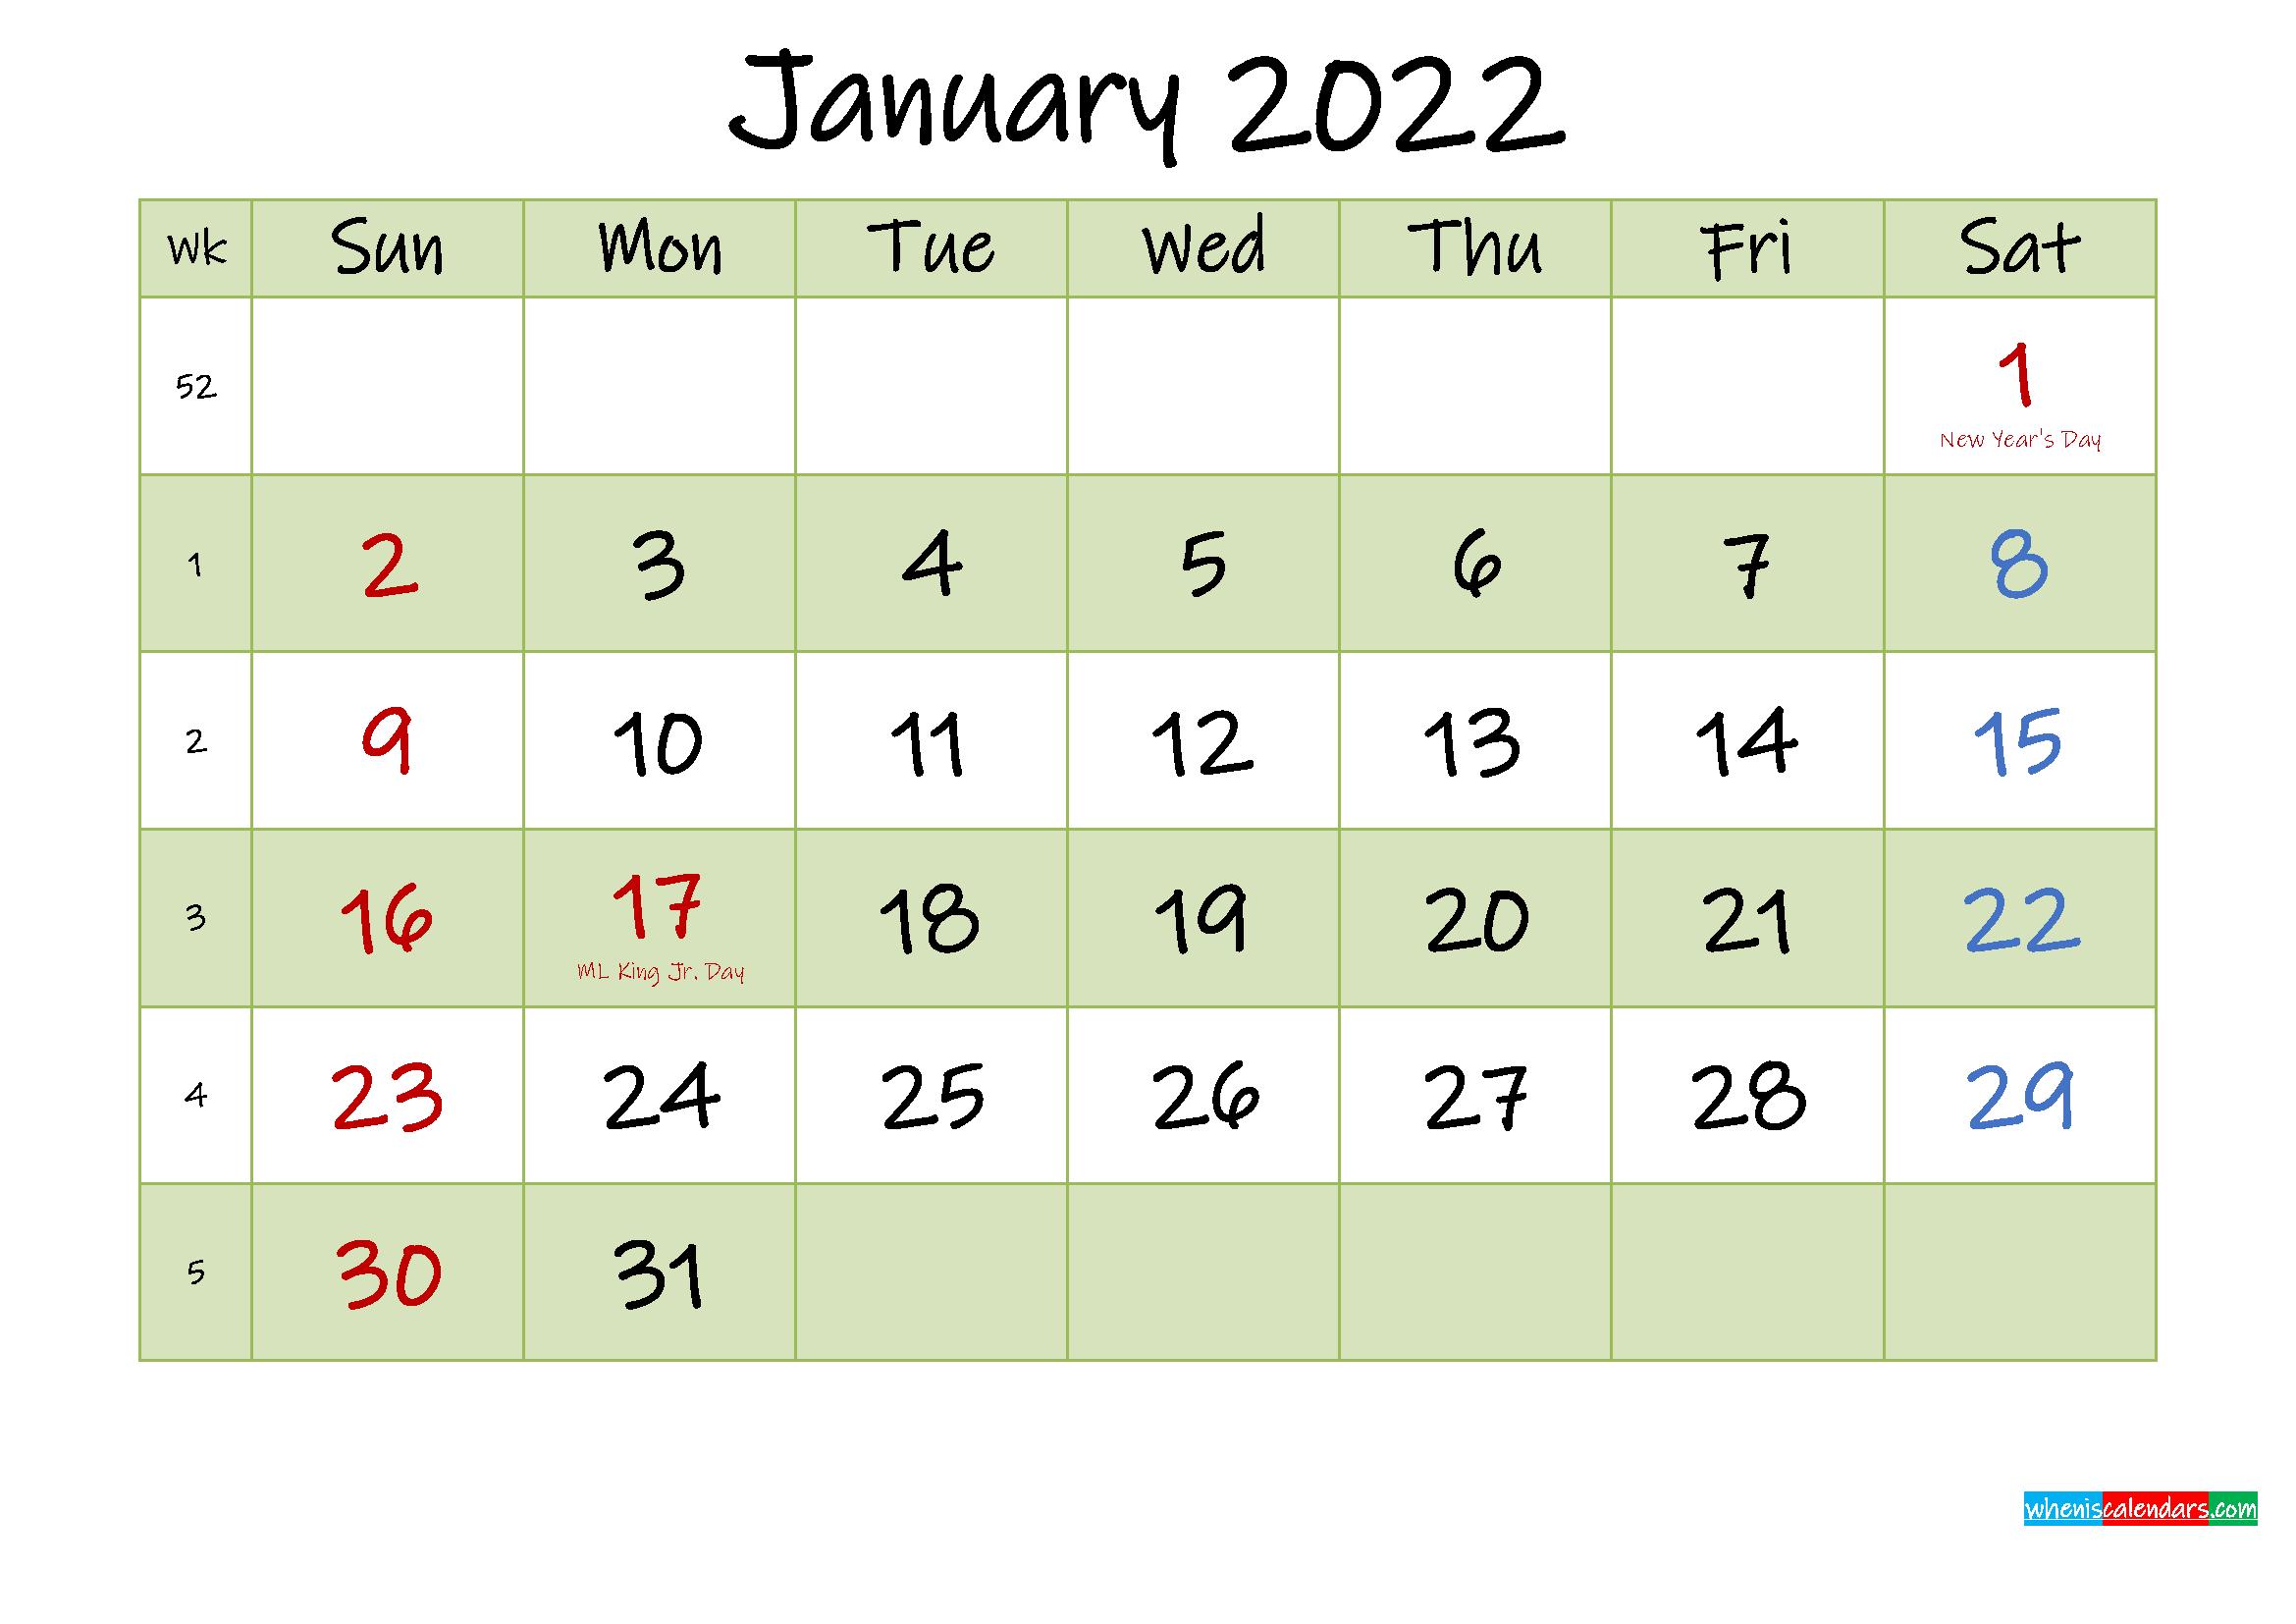 January 2022 Calendar With Holidays Printable – Template In January2022 Printable Calendar Cute